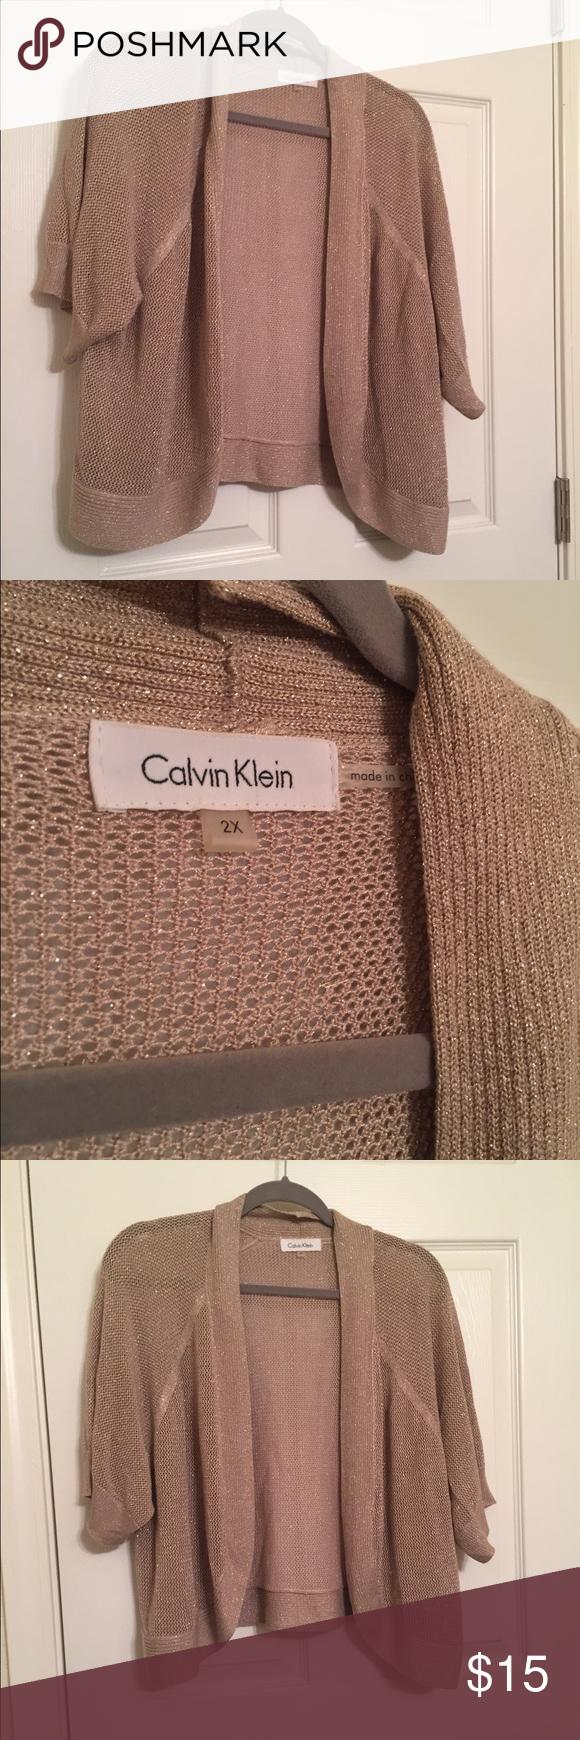 Calvin Klein gold shrug/open cardigan Size 2X Calvin Klein Sweaters Cardigans